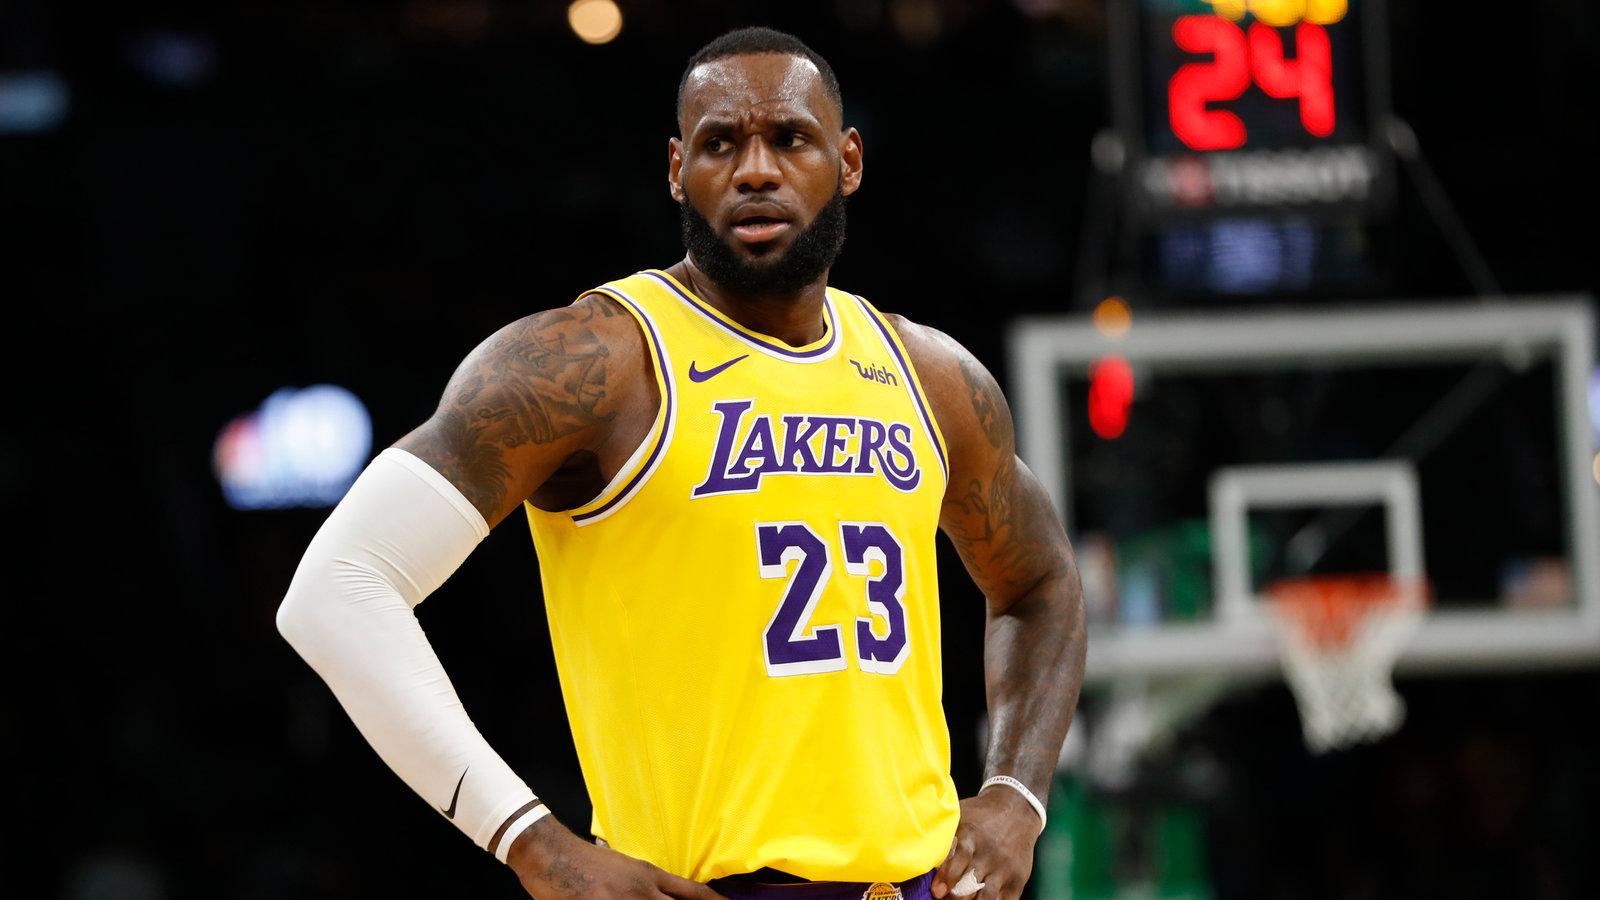 LeBron James - Lakers 23